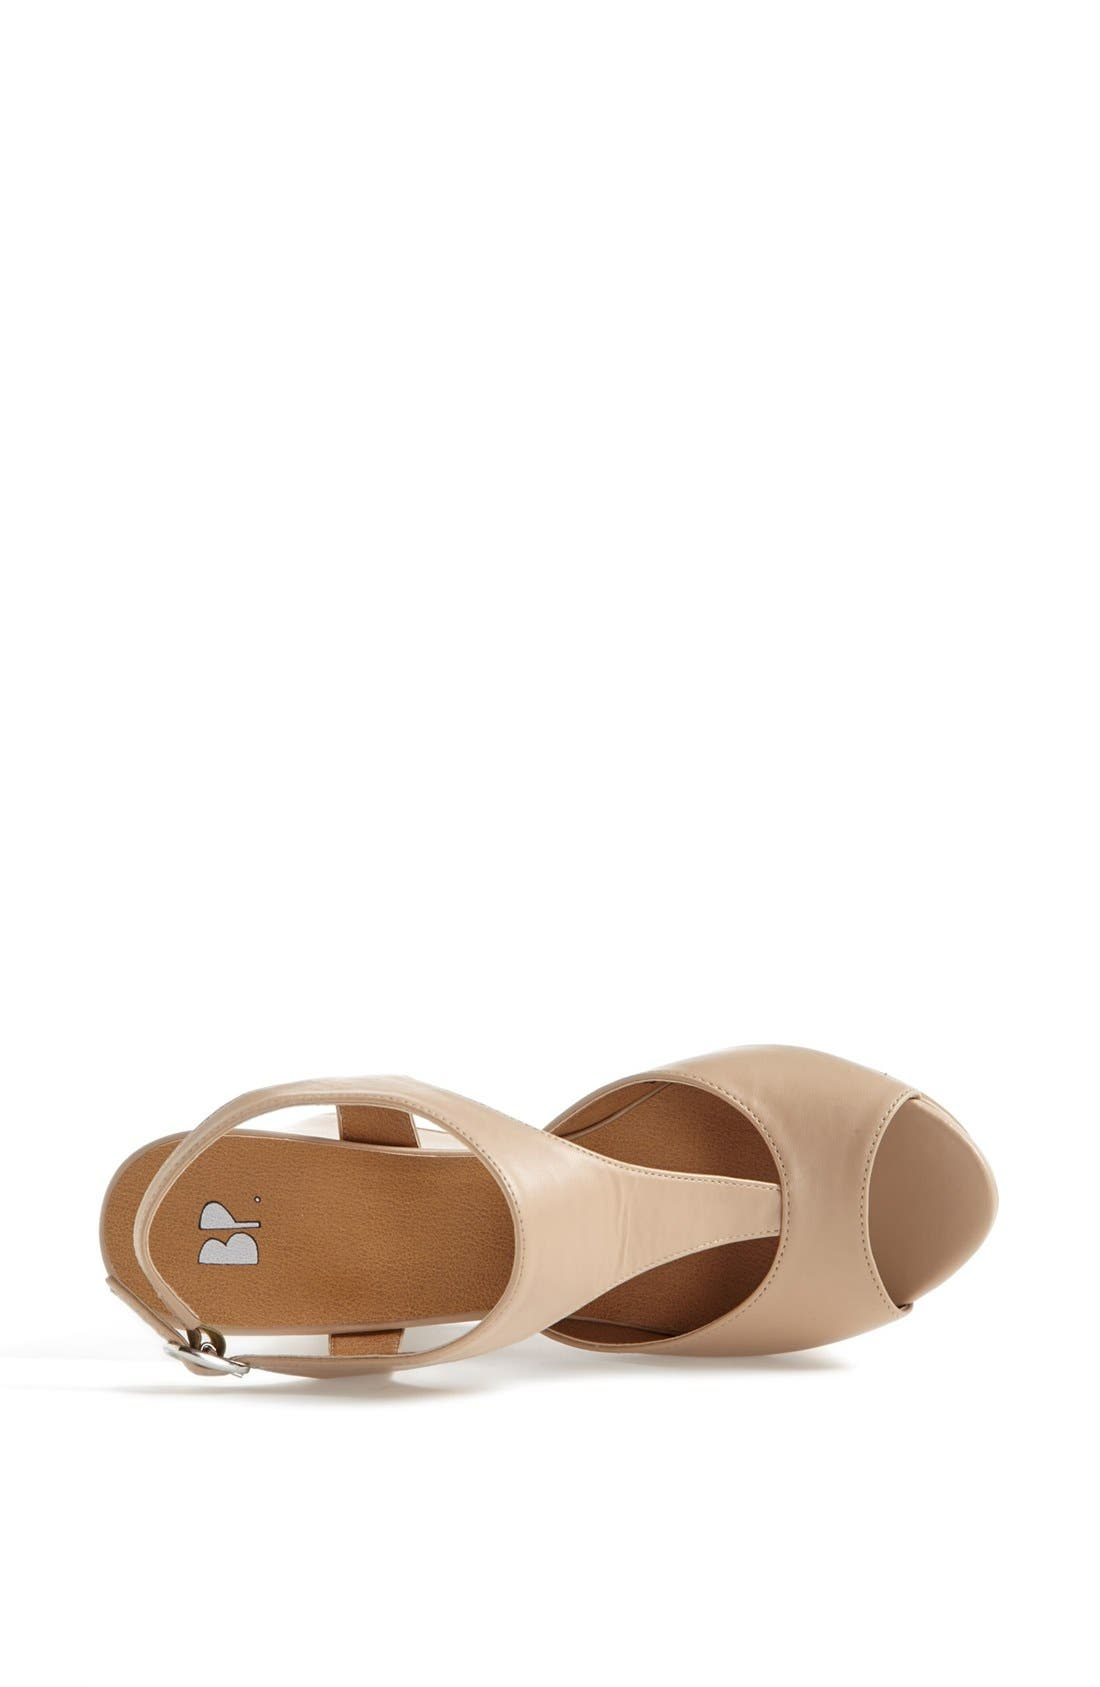 Alternate Image 3  - BP. 'Springs' Wedge Sandal (Women)